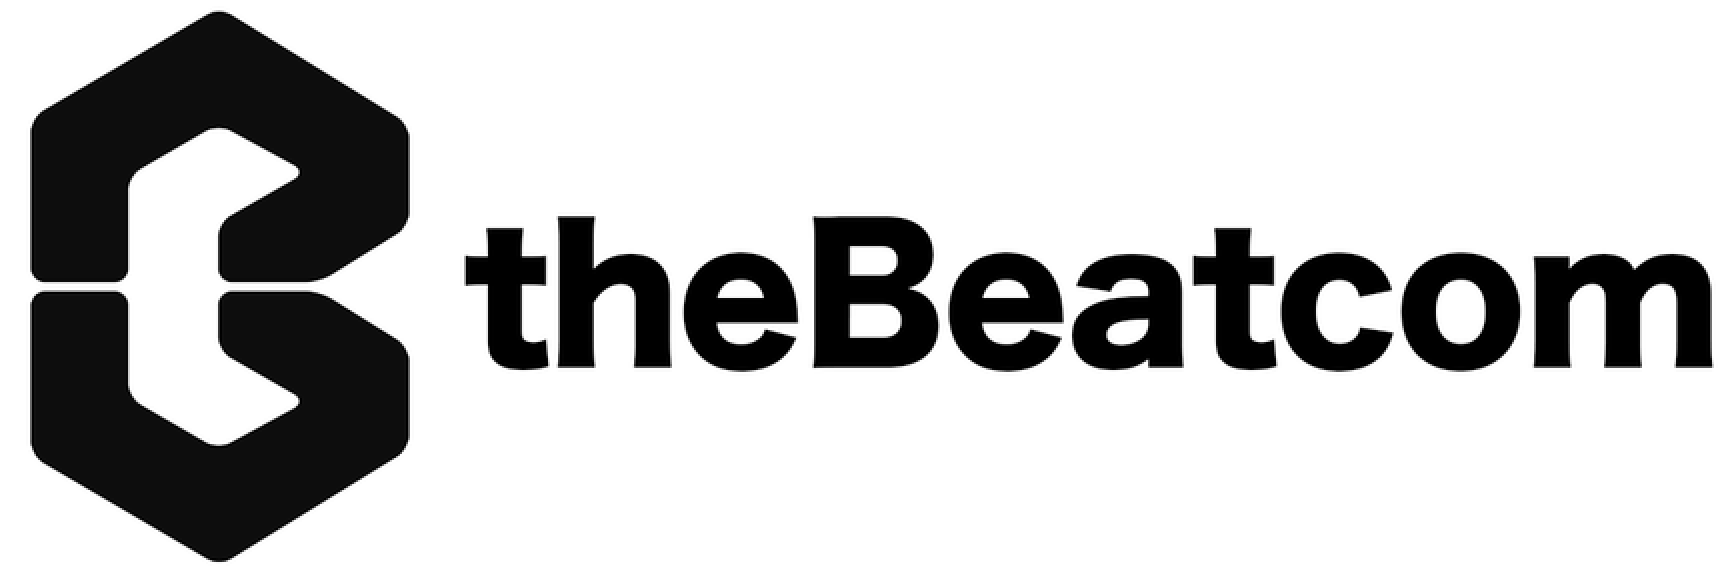 TheBeatcom